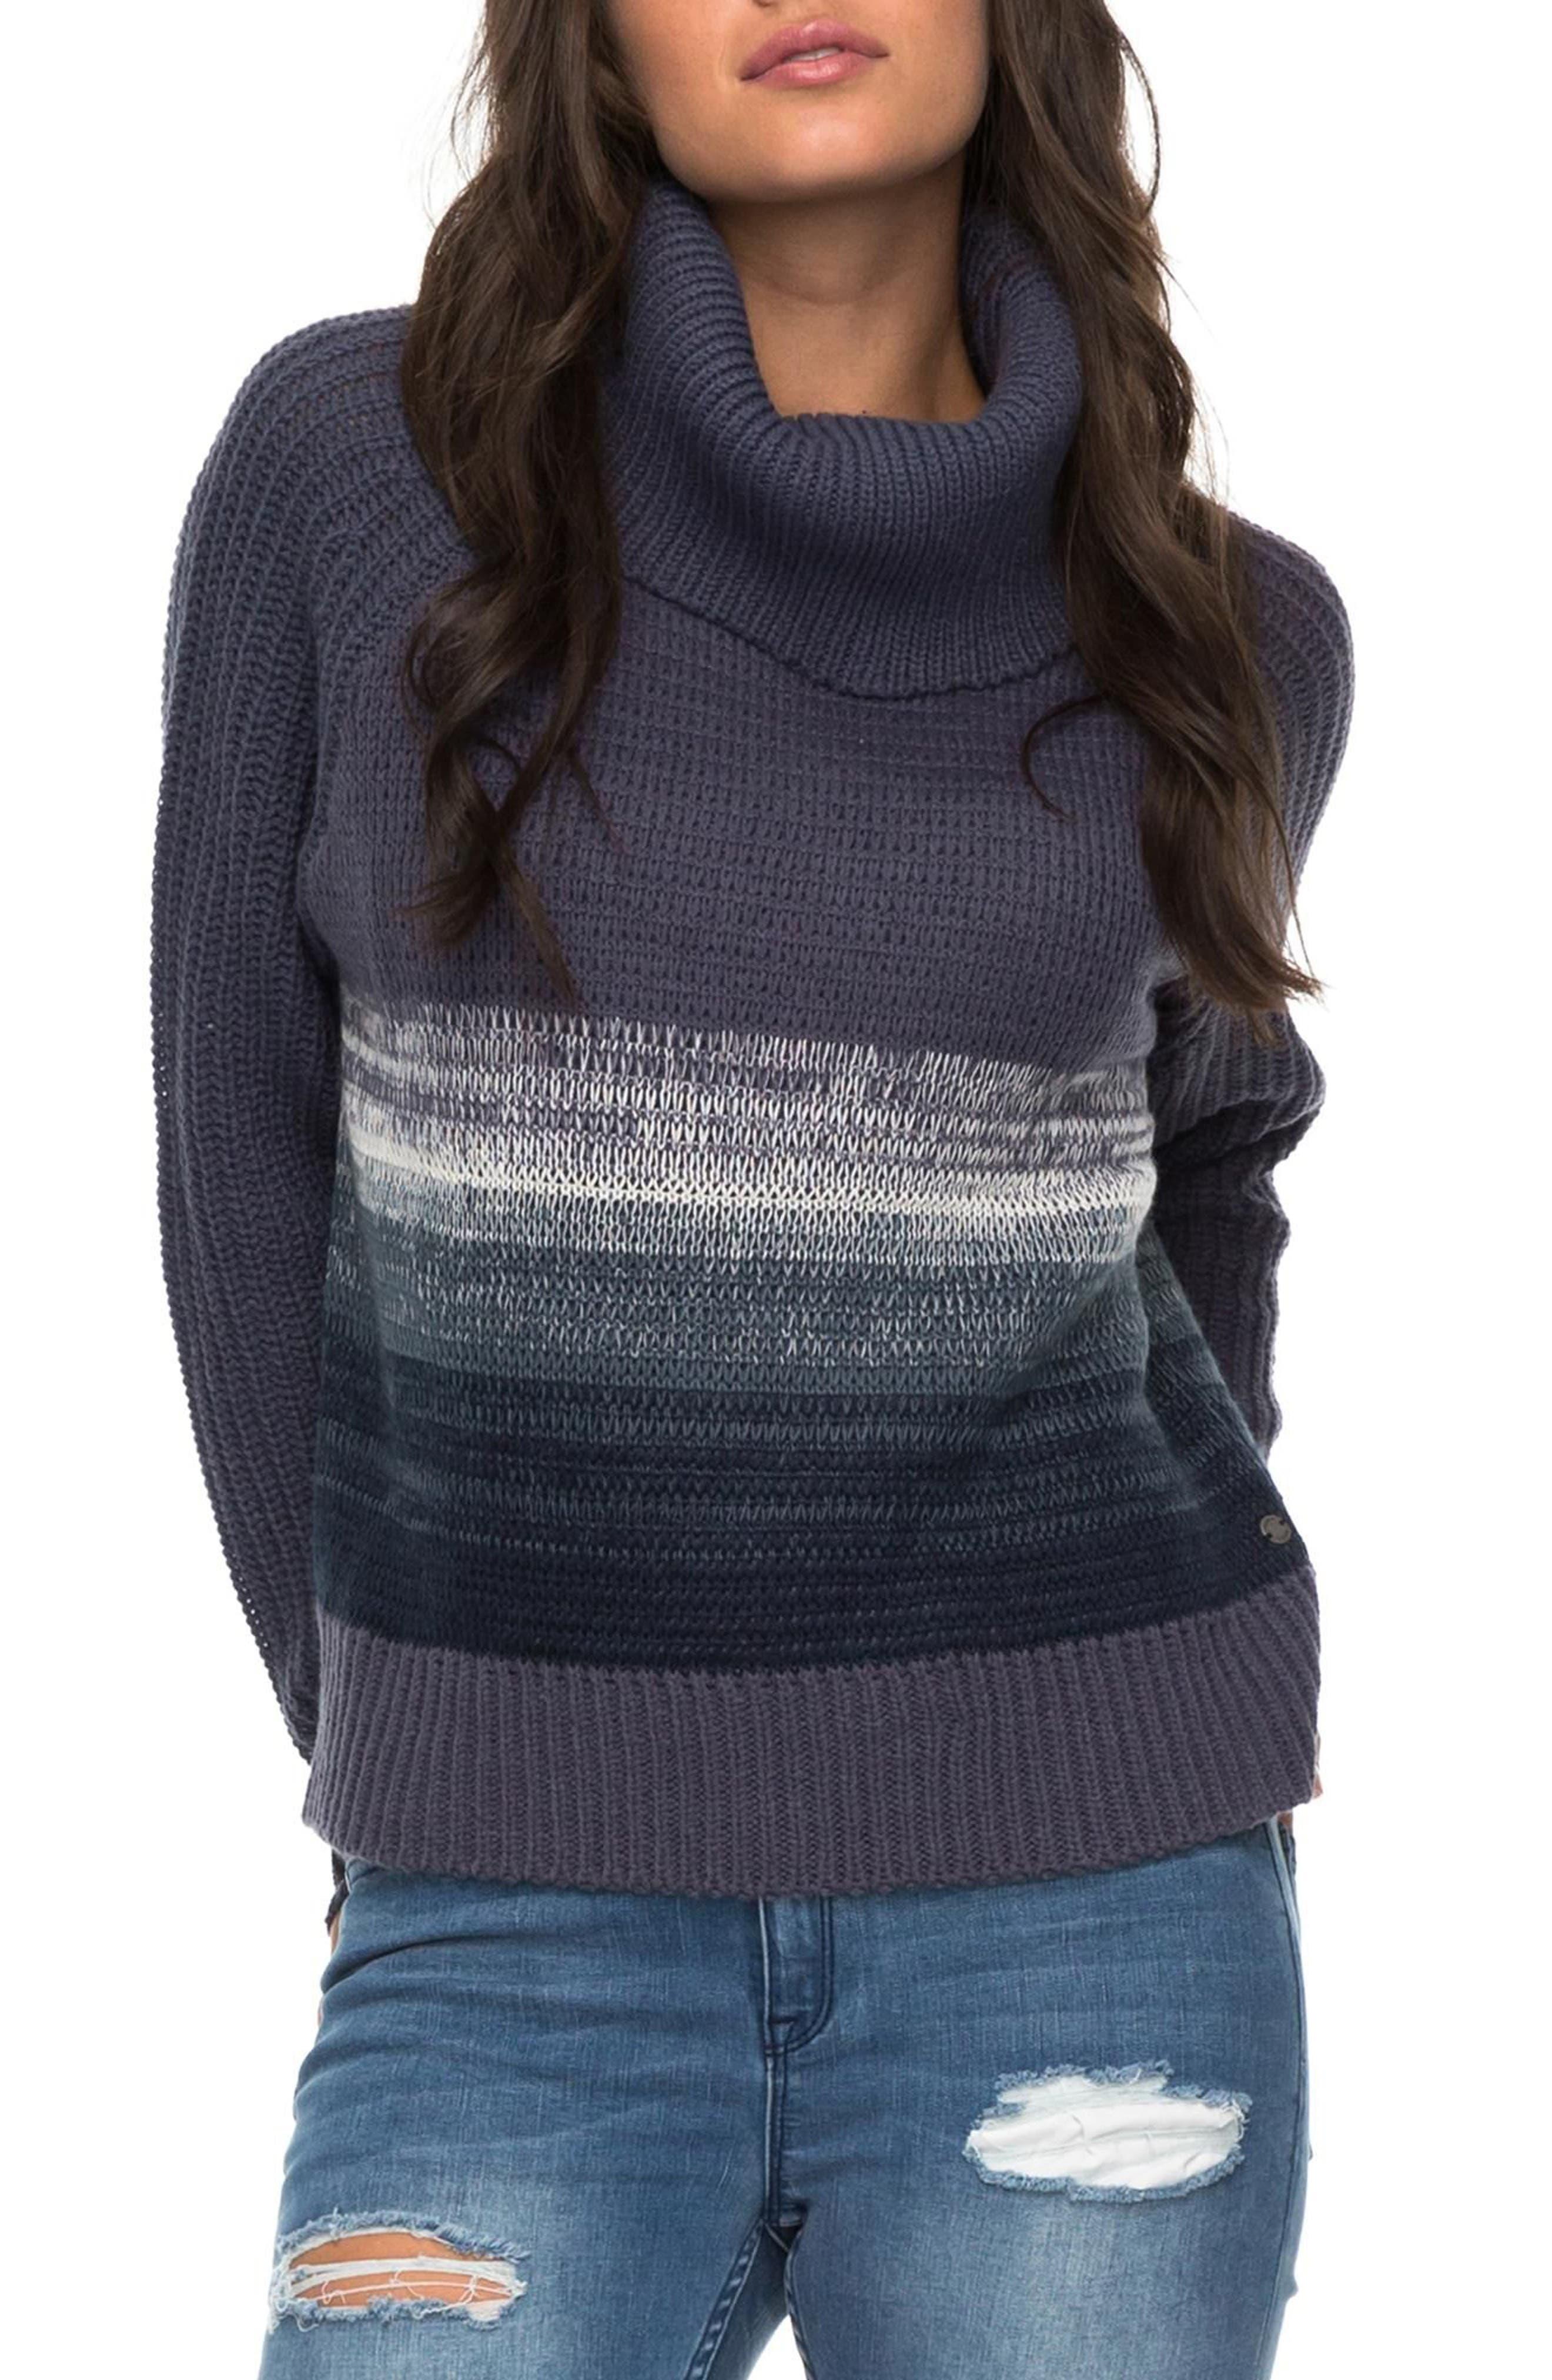 Roxy Morning Sun Sweater